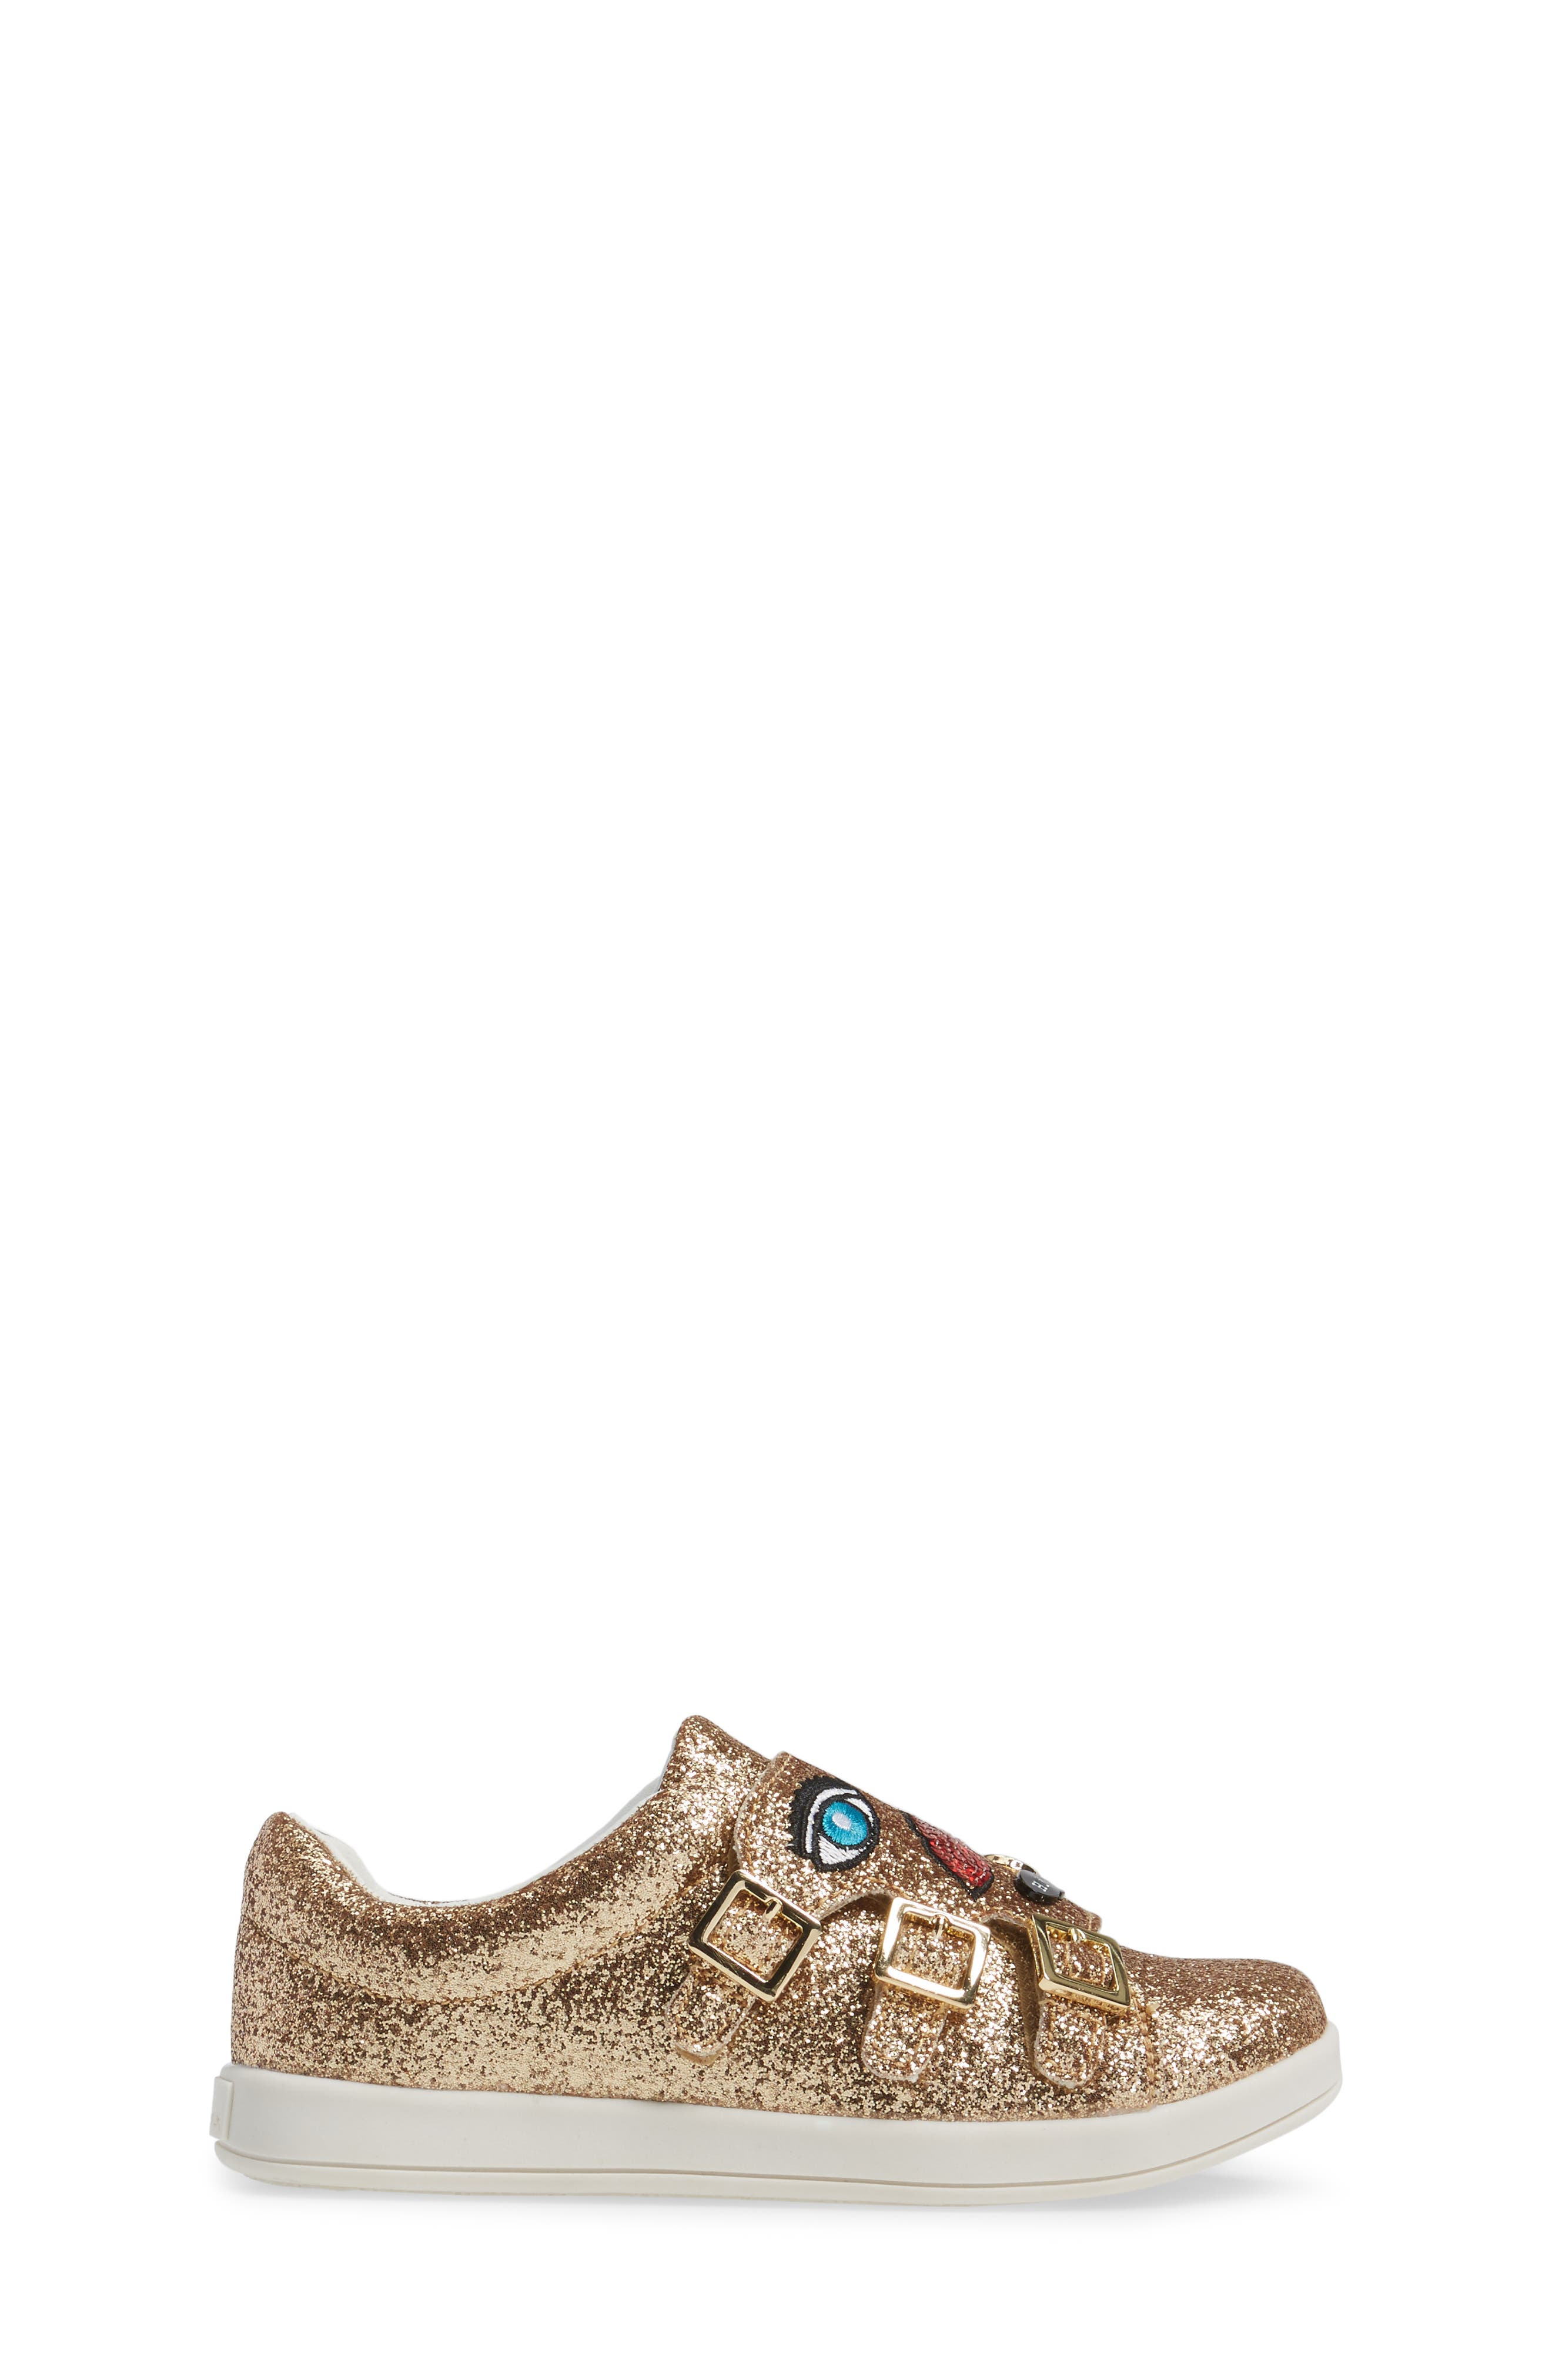 Liv Wendy Glitter Emoji Sneaker,                             Alternate thumbnail 3, color,                             710